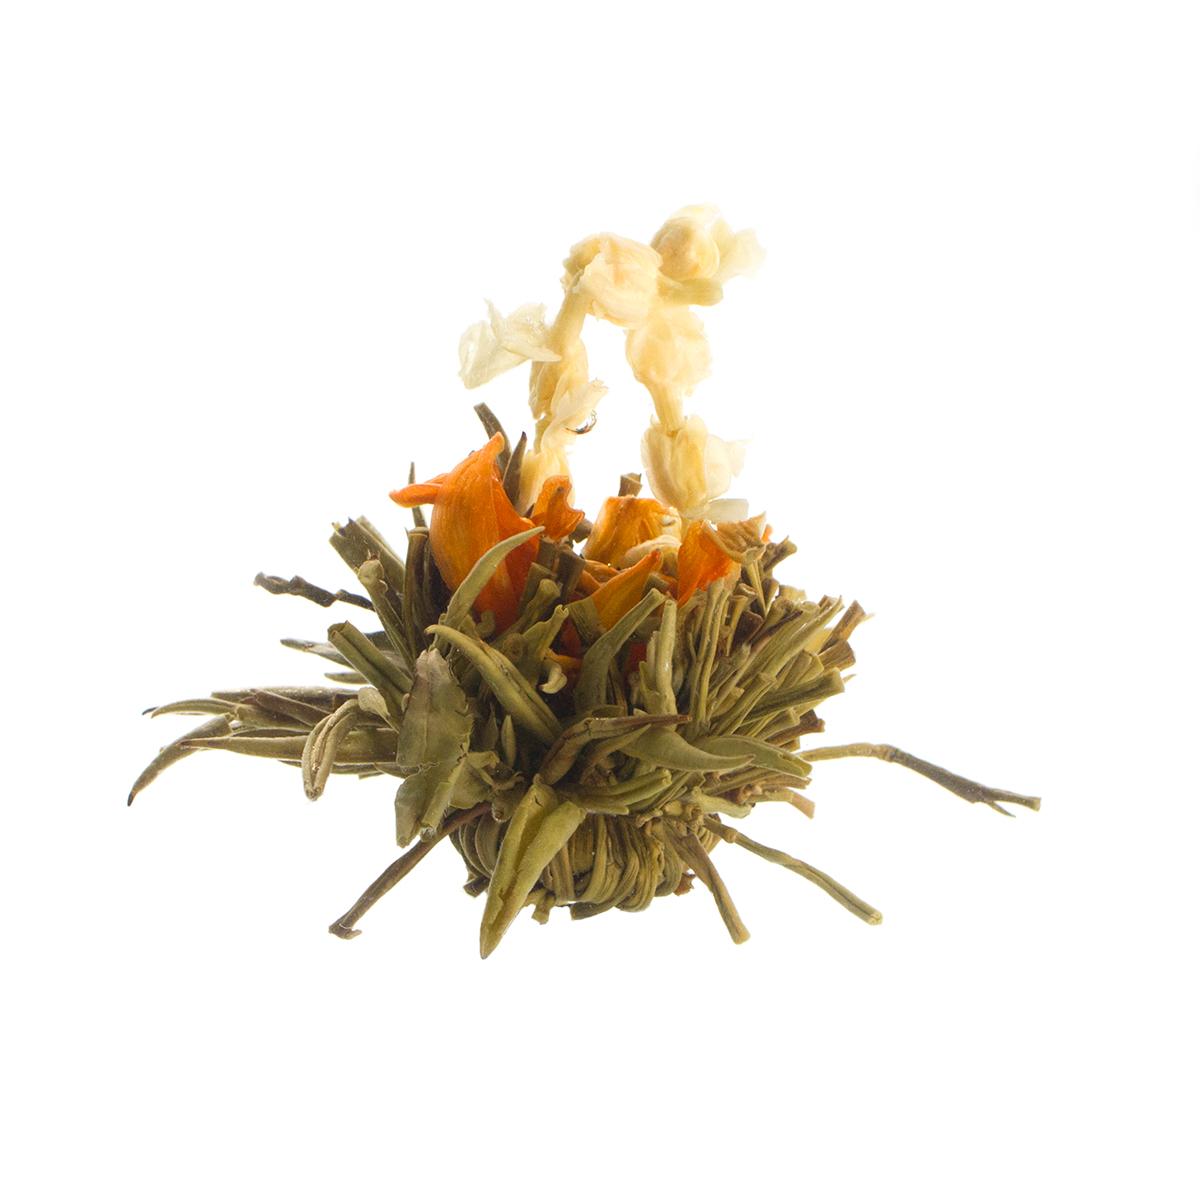 Чхун Дянг Хуа Юэ (Цветок весенней реки), упаковка 5 шт от 101 Чай